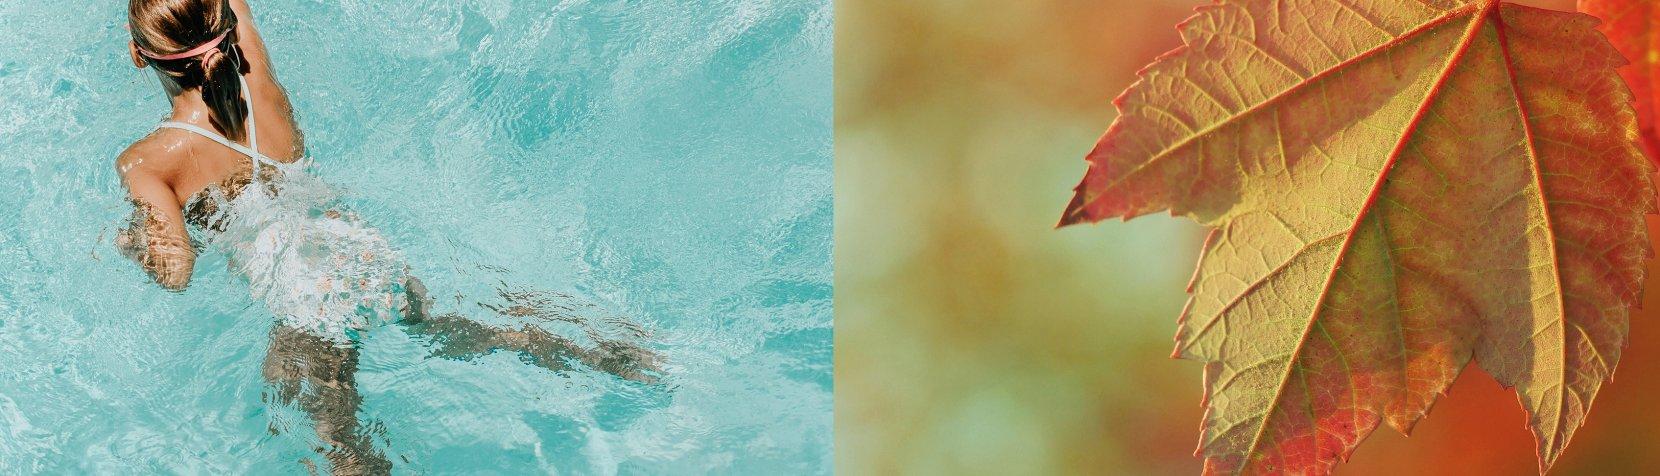 Efterårsferie i svømmehallen